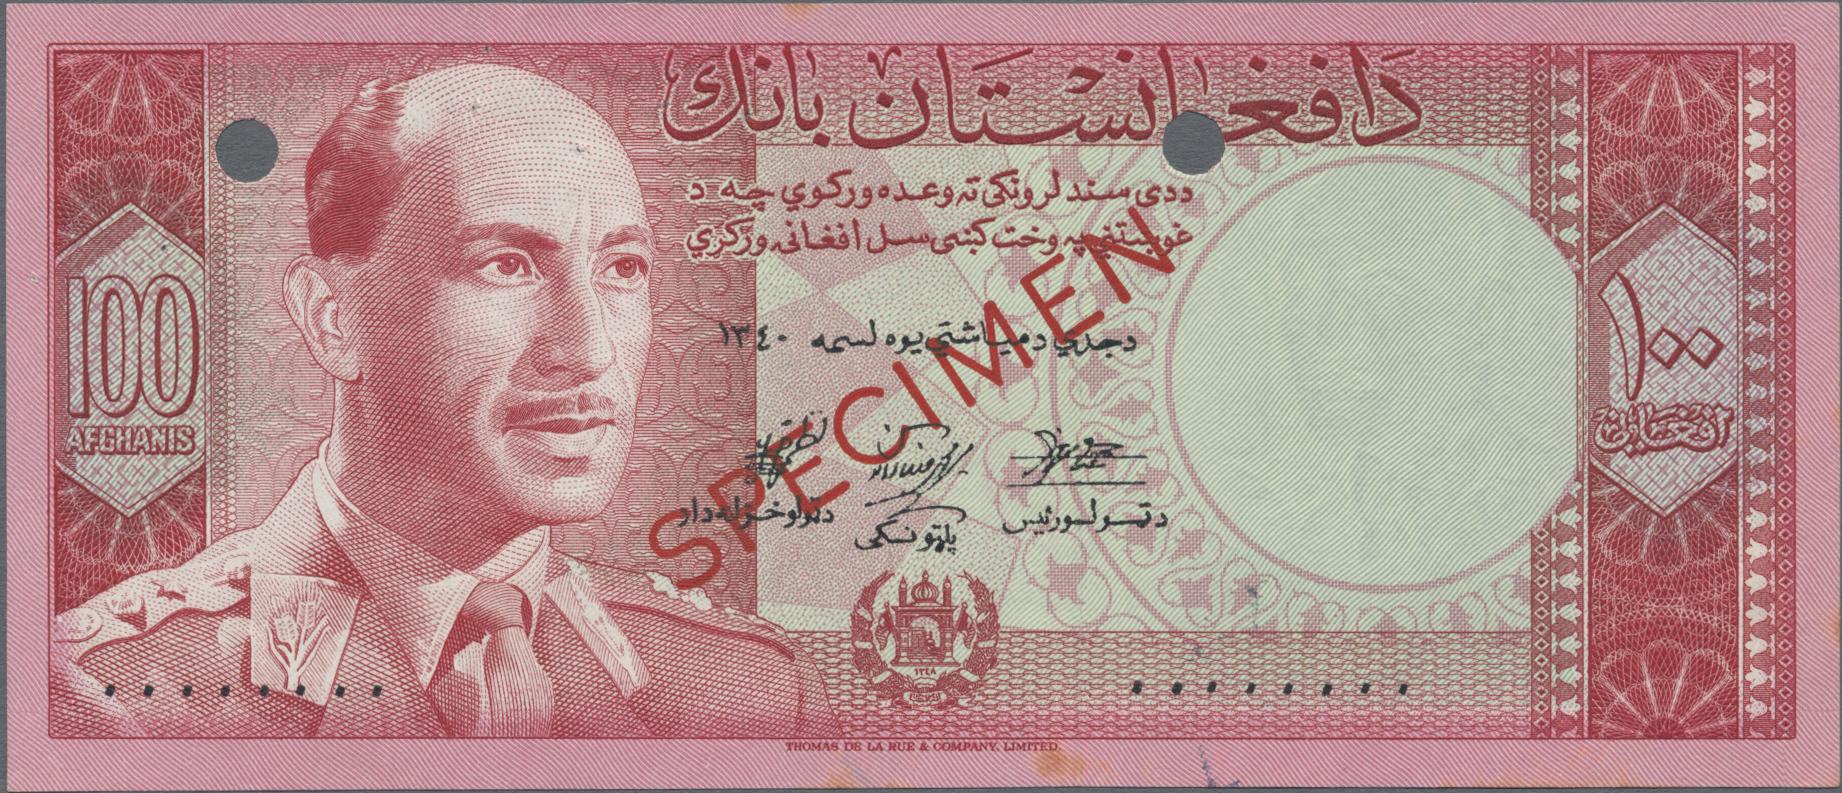 Lot 00005 - Afghanistan   Banknoten  -  Auktionshaus Christoph Gärtner GmbH & Co. KG Sale #48 The Banknotes